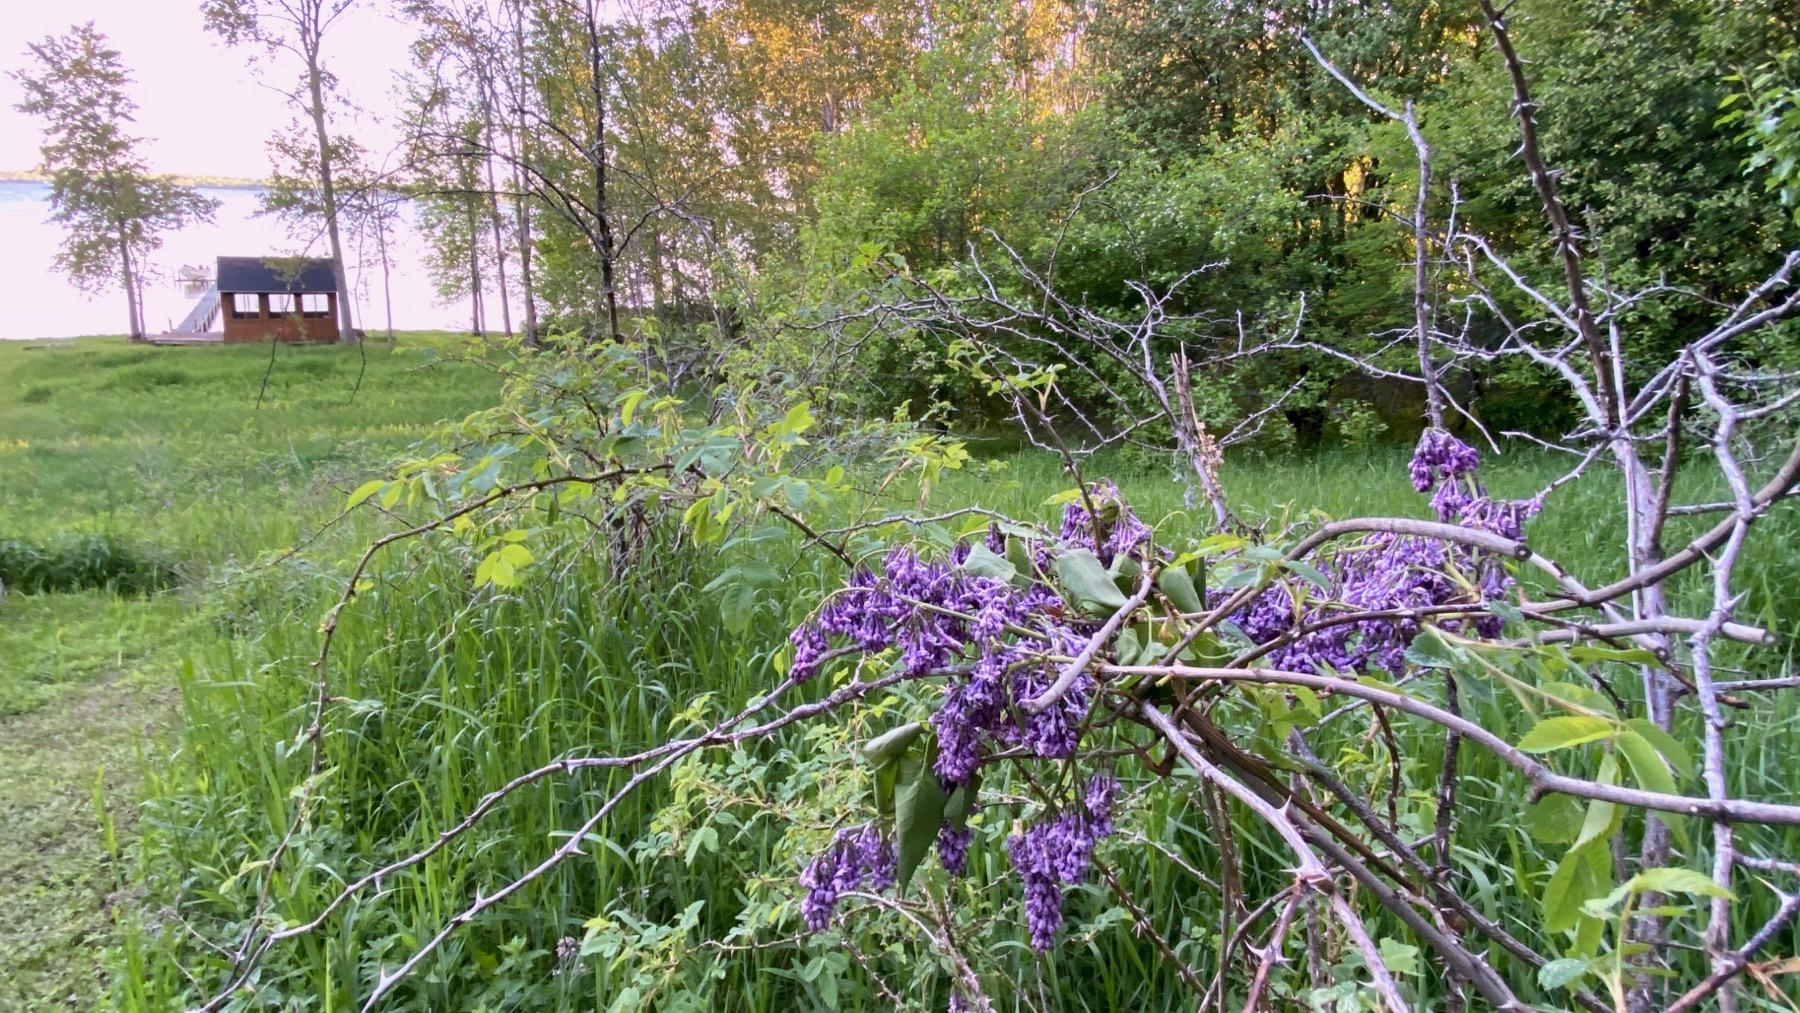 Not wisteria